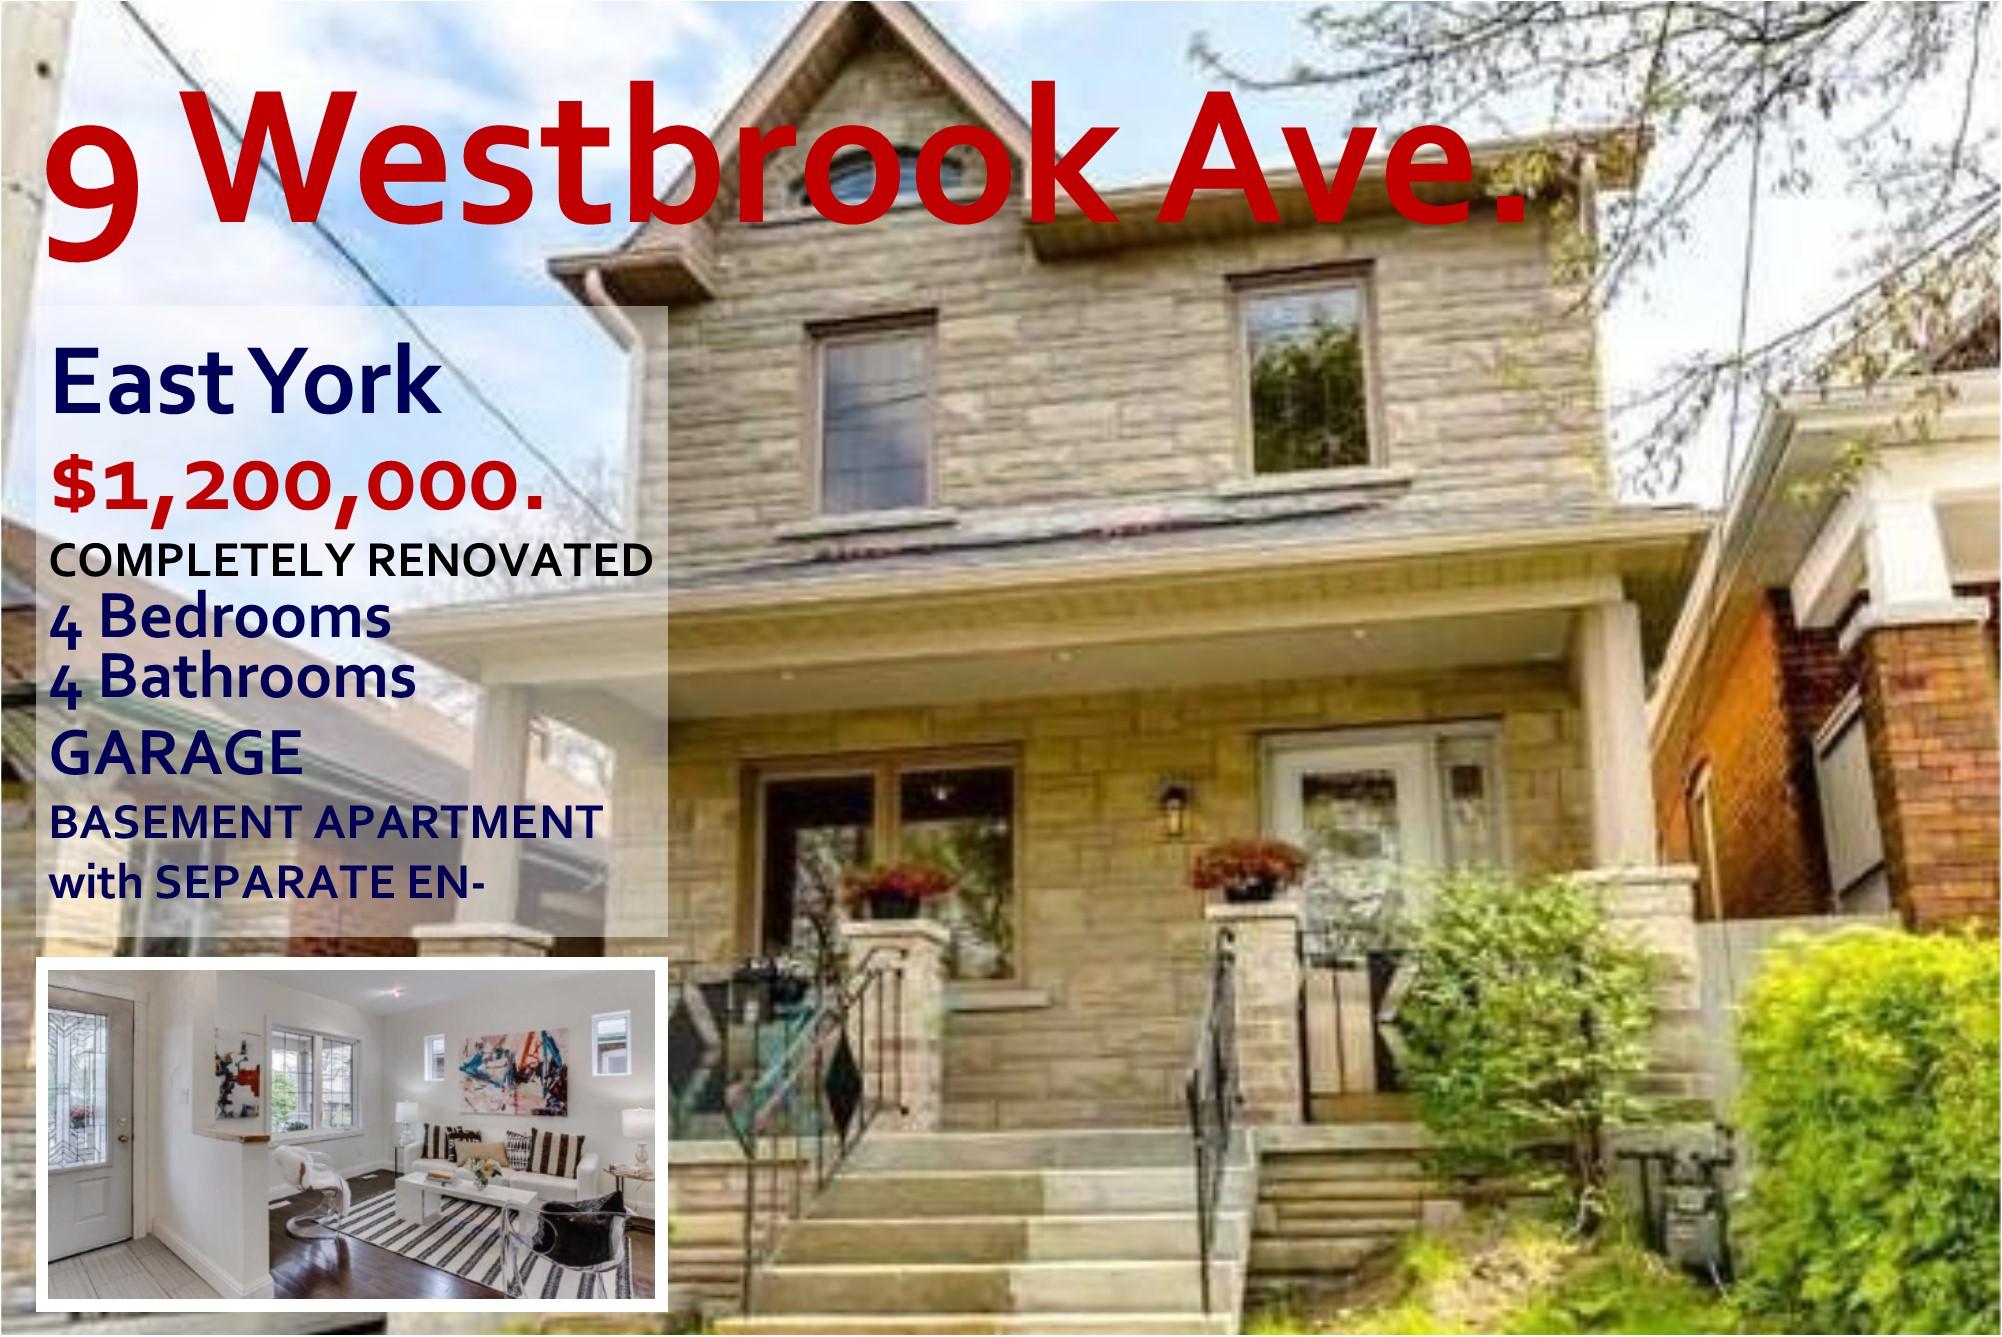 9 Westbrook Ave. TWITTER.jpg